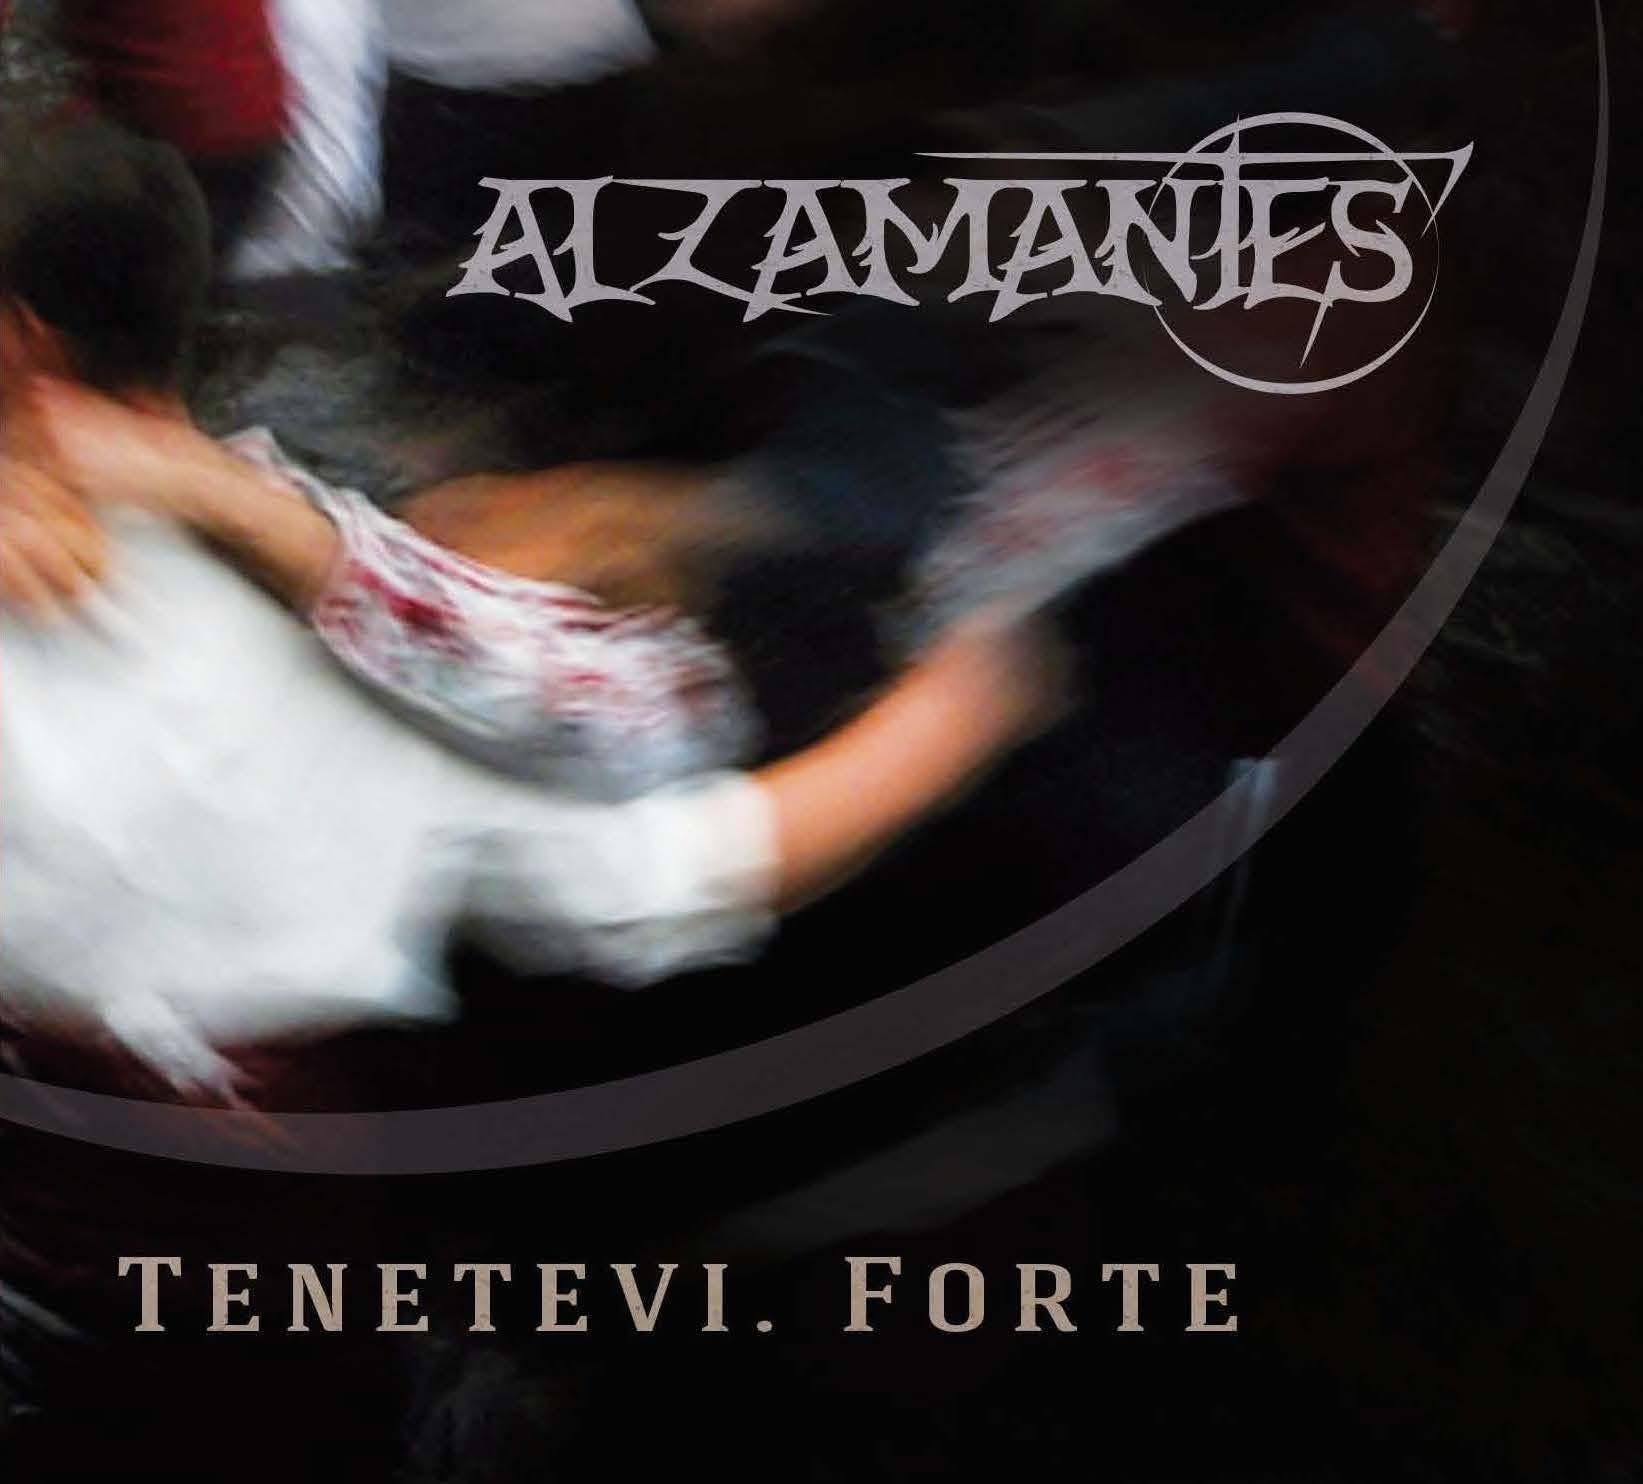 Alzamantes, Folk, Folk Rock, Balfolk, Dario Tornaghi, Tenetevi forte